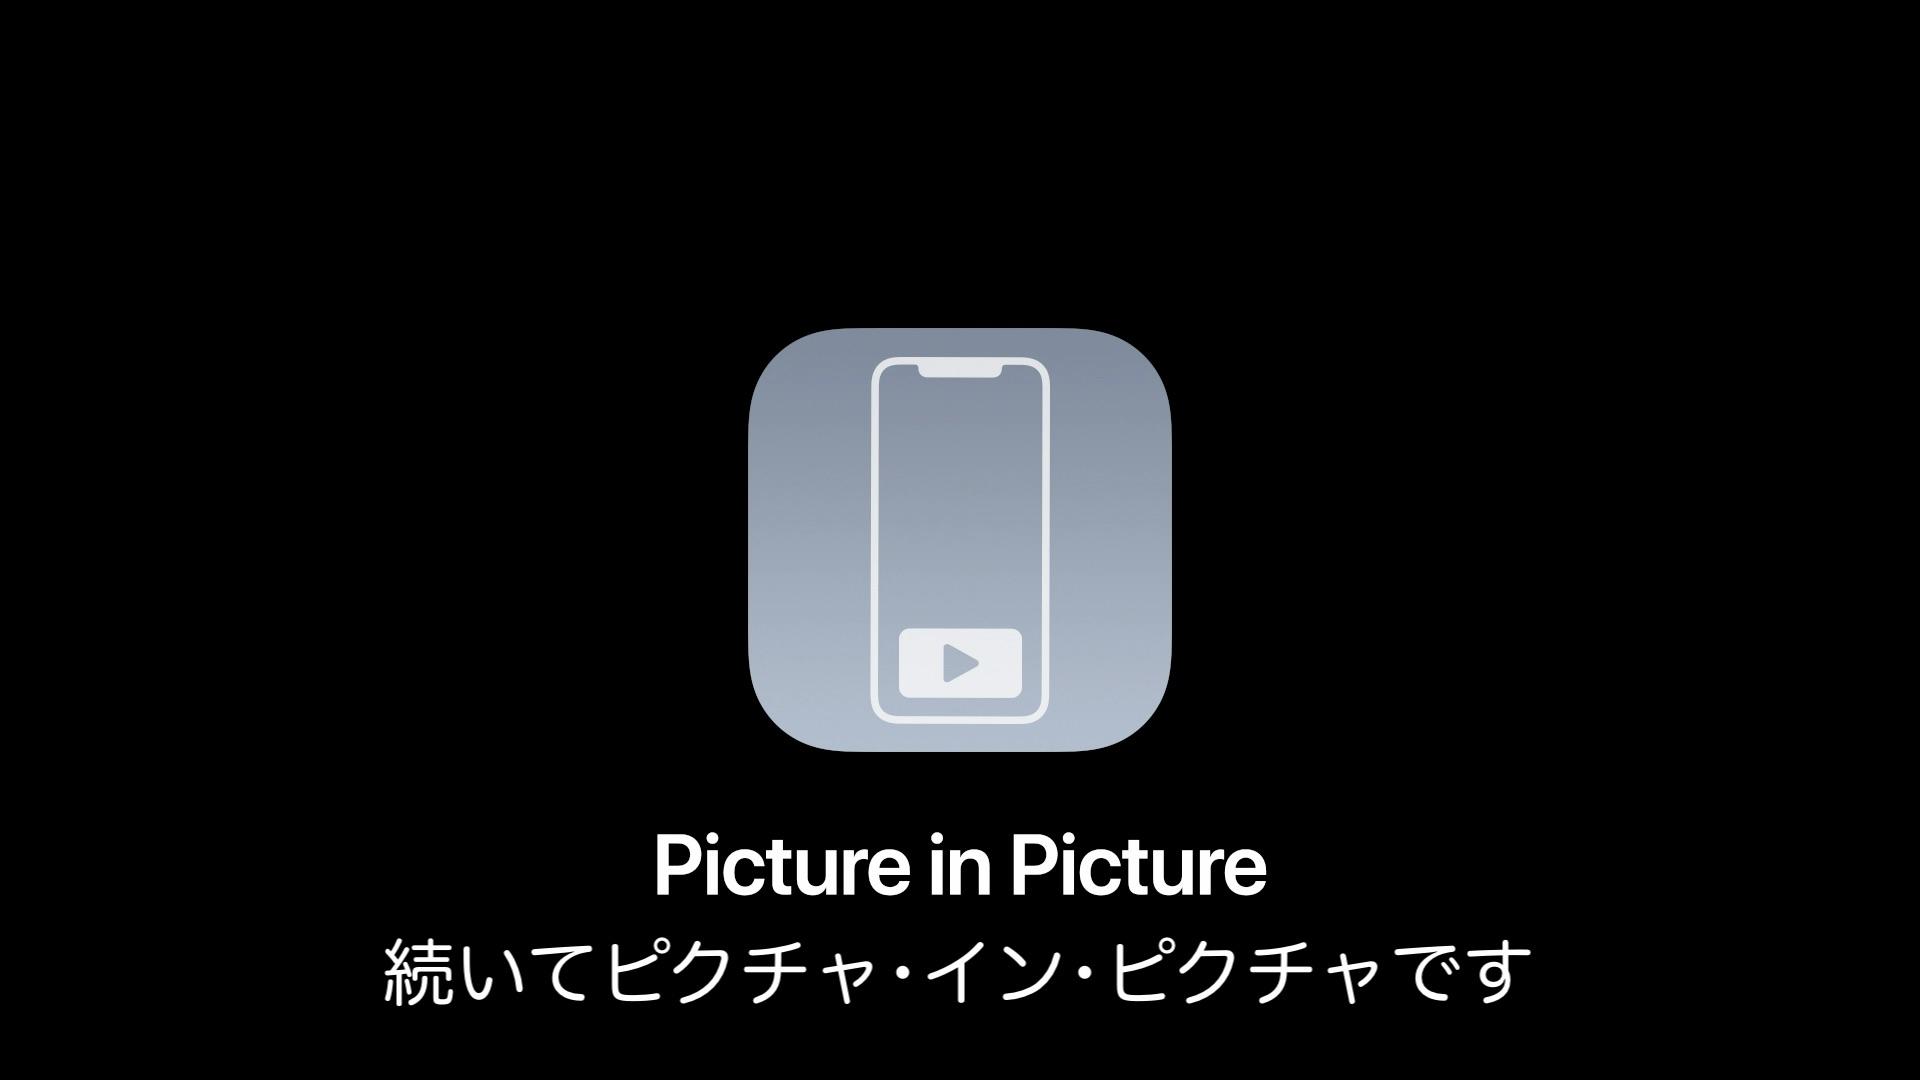 iOS 14のPinP